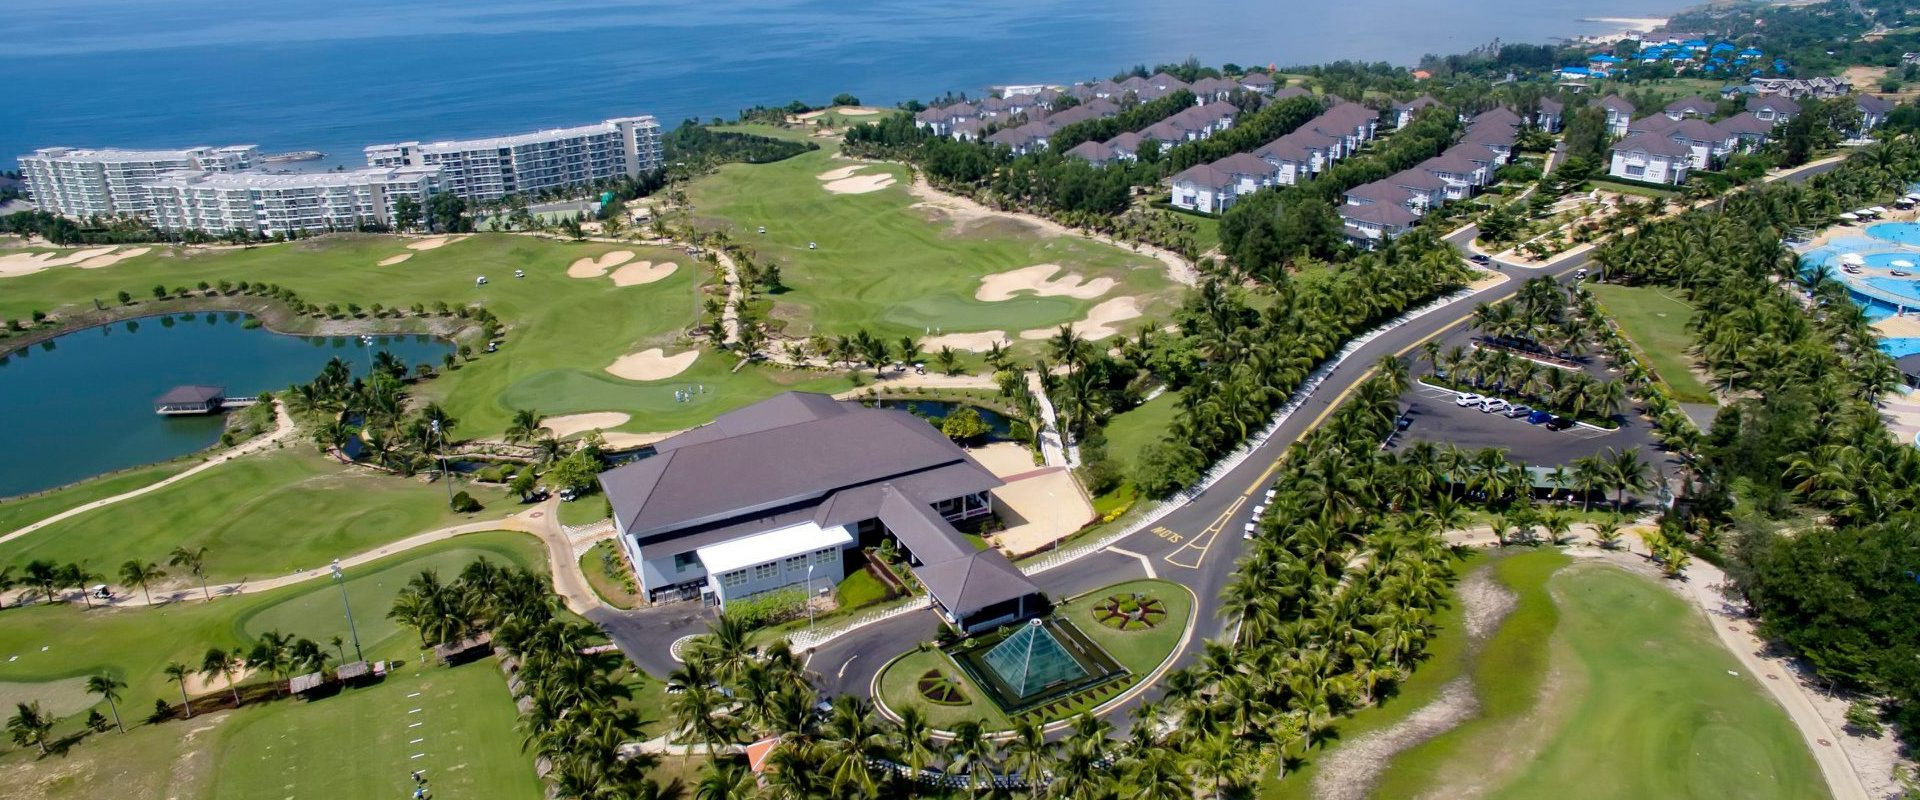 9 Golf Holidays in Vietnam: 7. Golf in Mui Ne